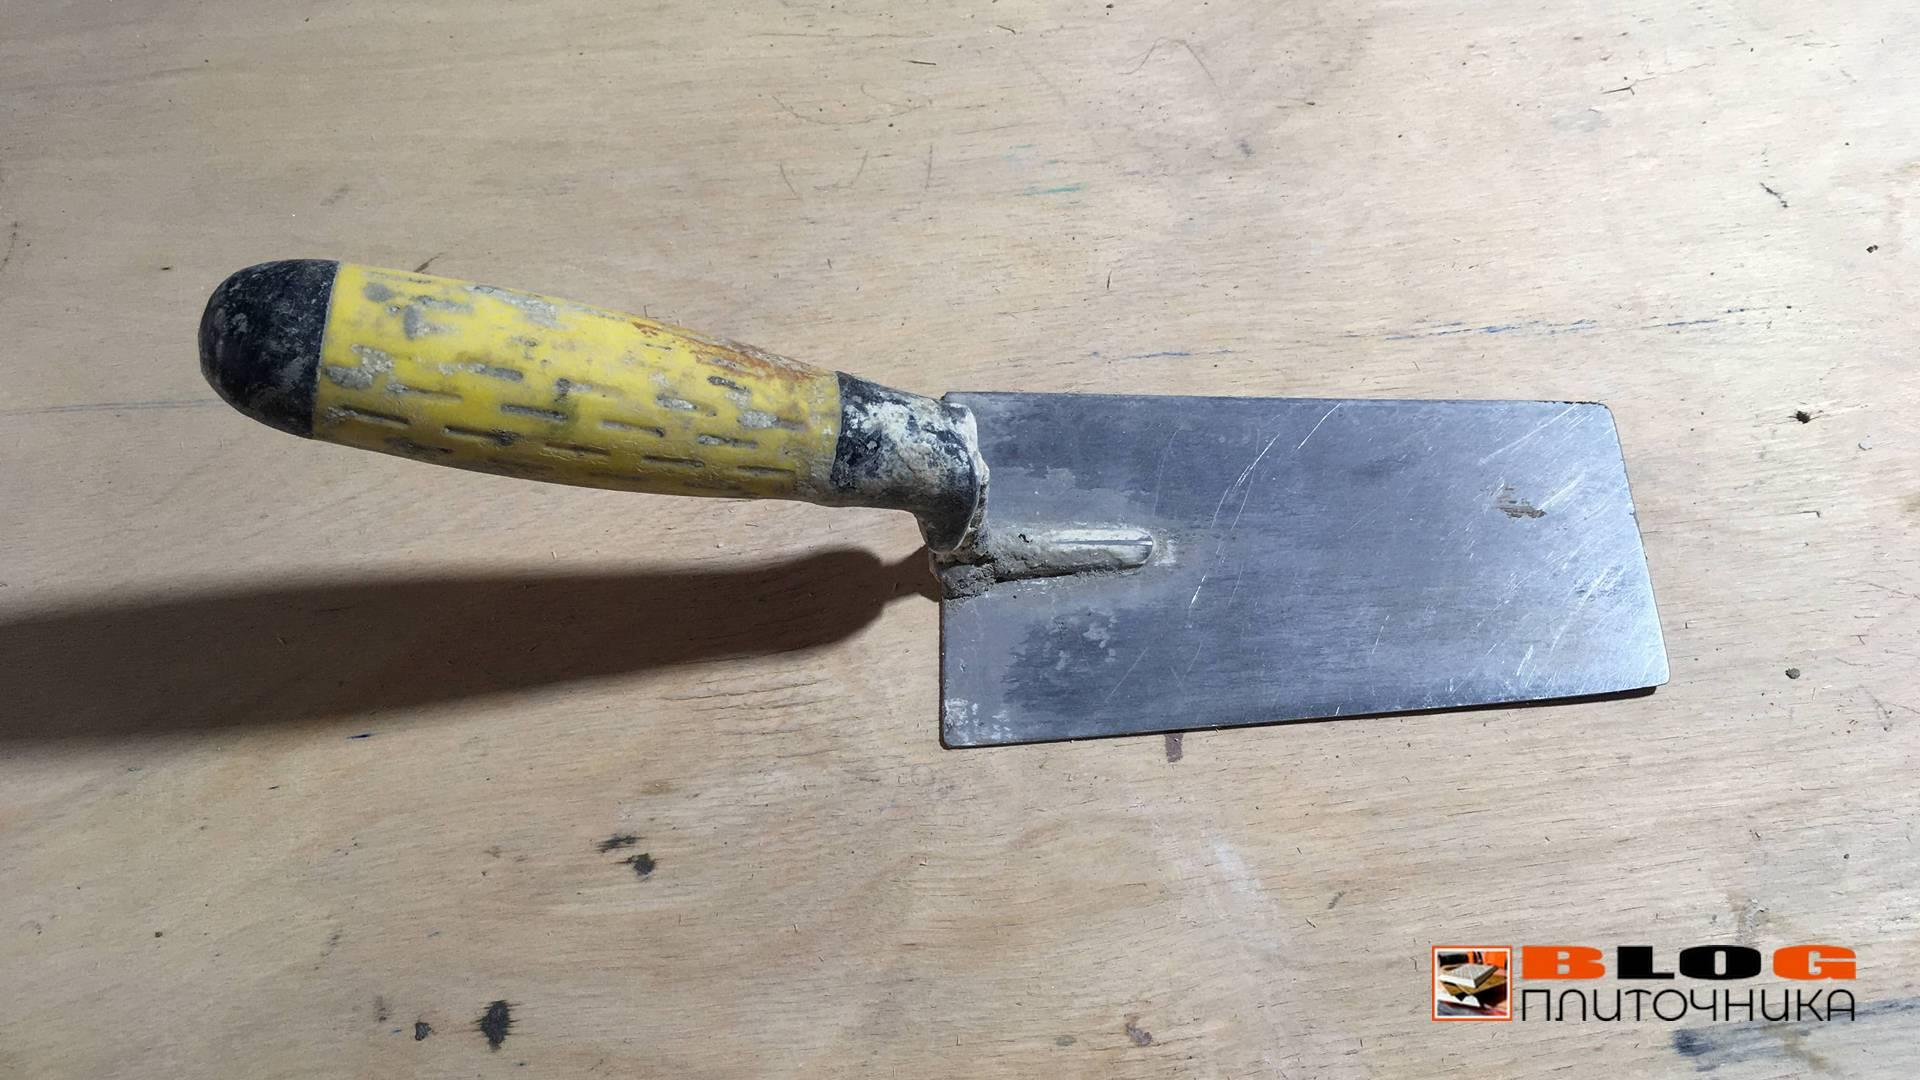 лучшая форма мастерка плиточника блог плиточника